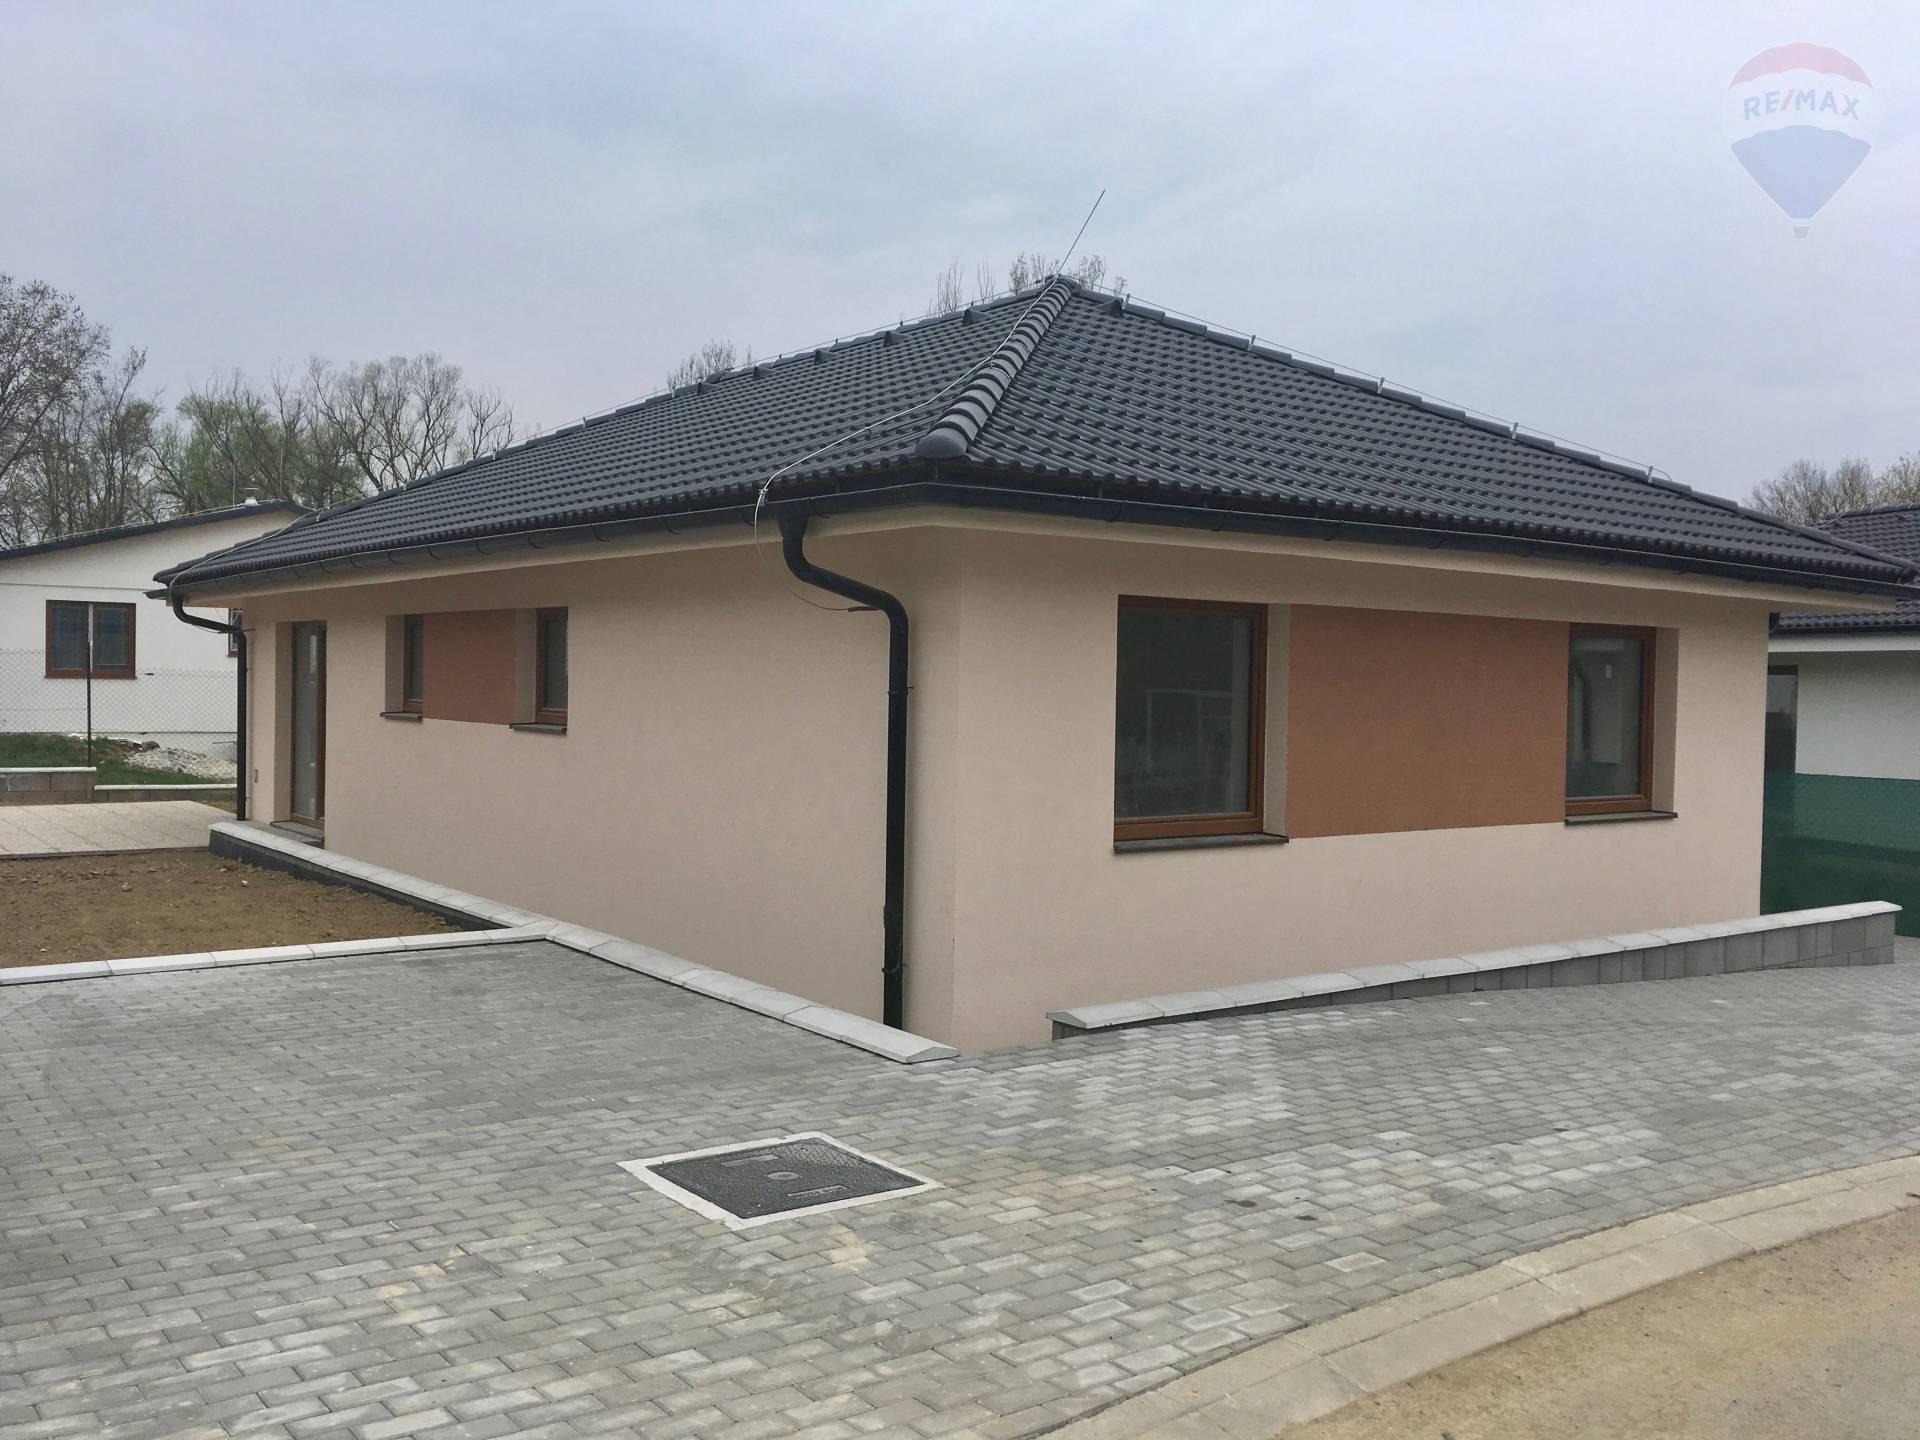 REZERVOVANÉ !!! Novostavba rodinného domu v tichom prostredí